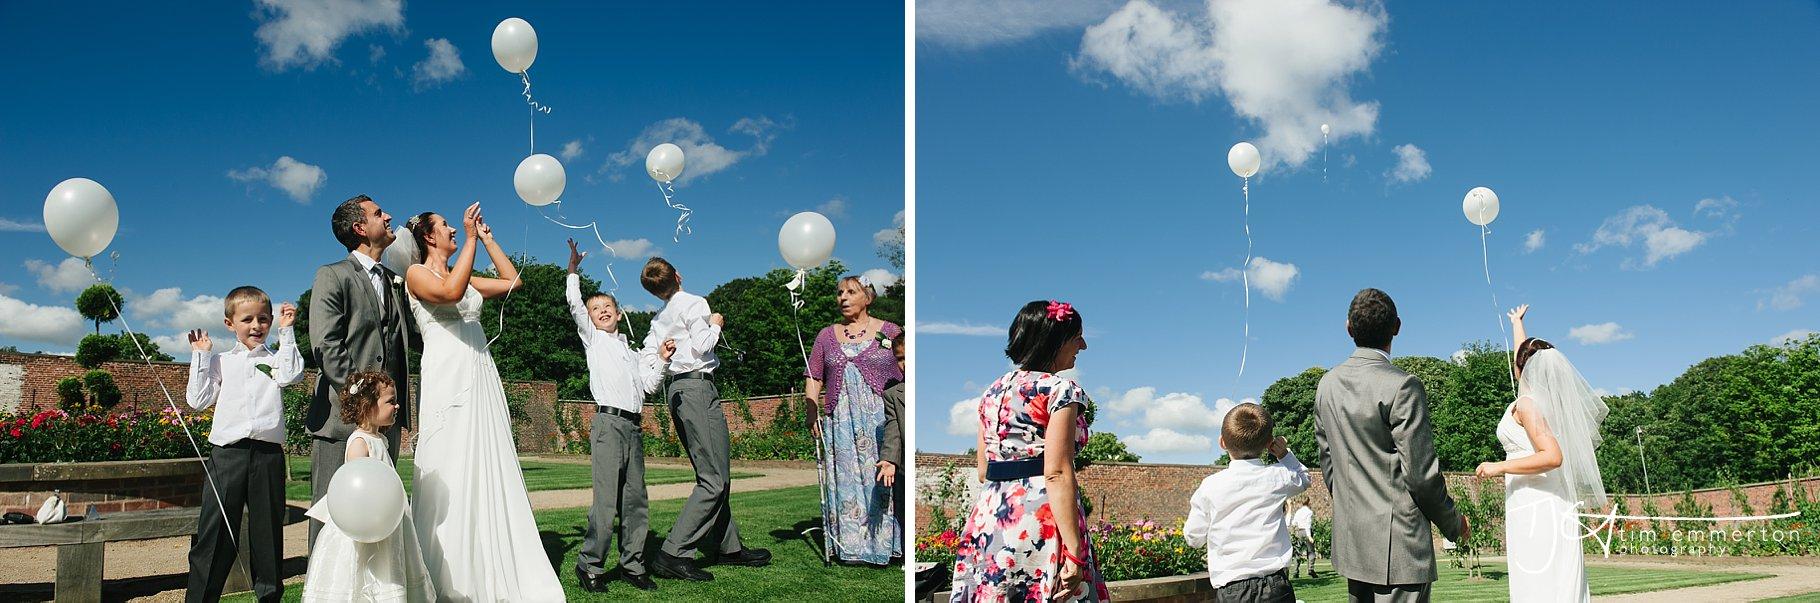 Northcote-Wedding-Photos-095.jpg